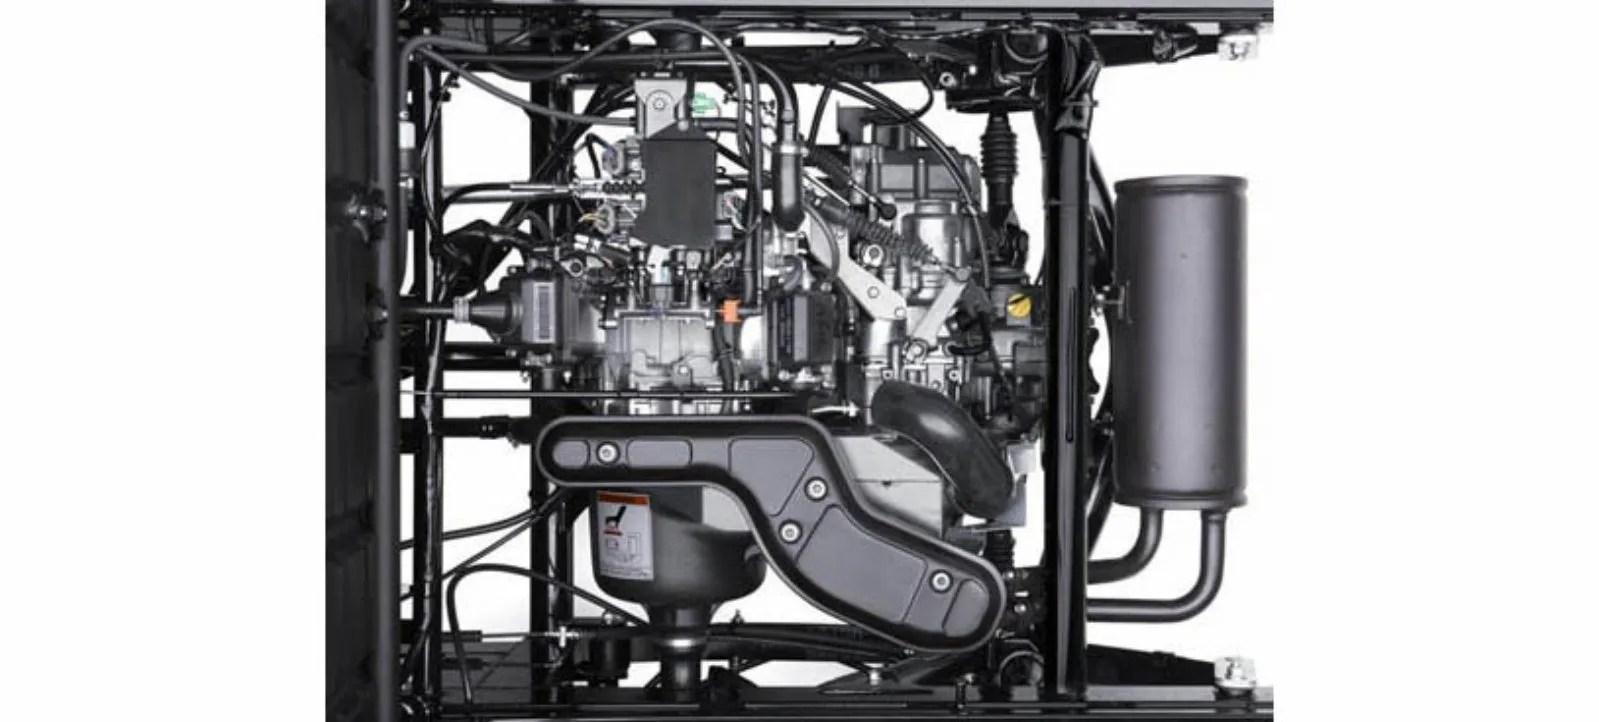 hight resolution of kawasaki mule 4010 fuel filter location